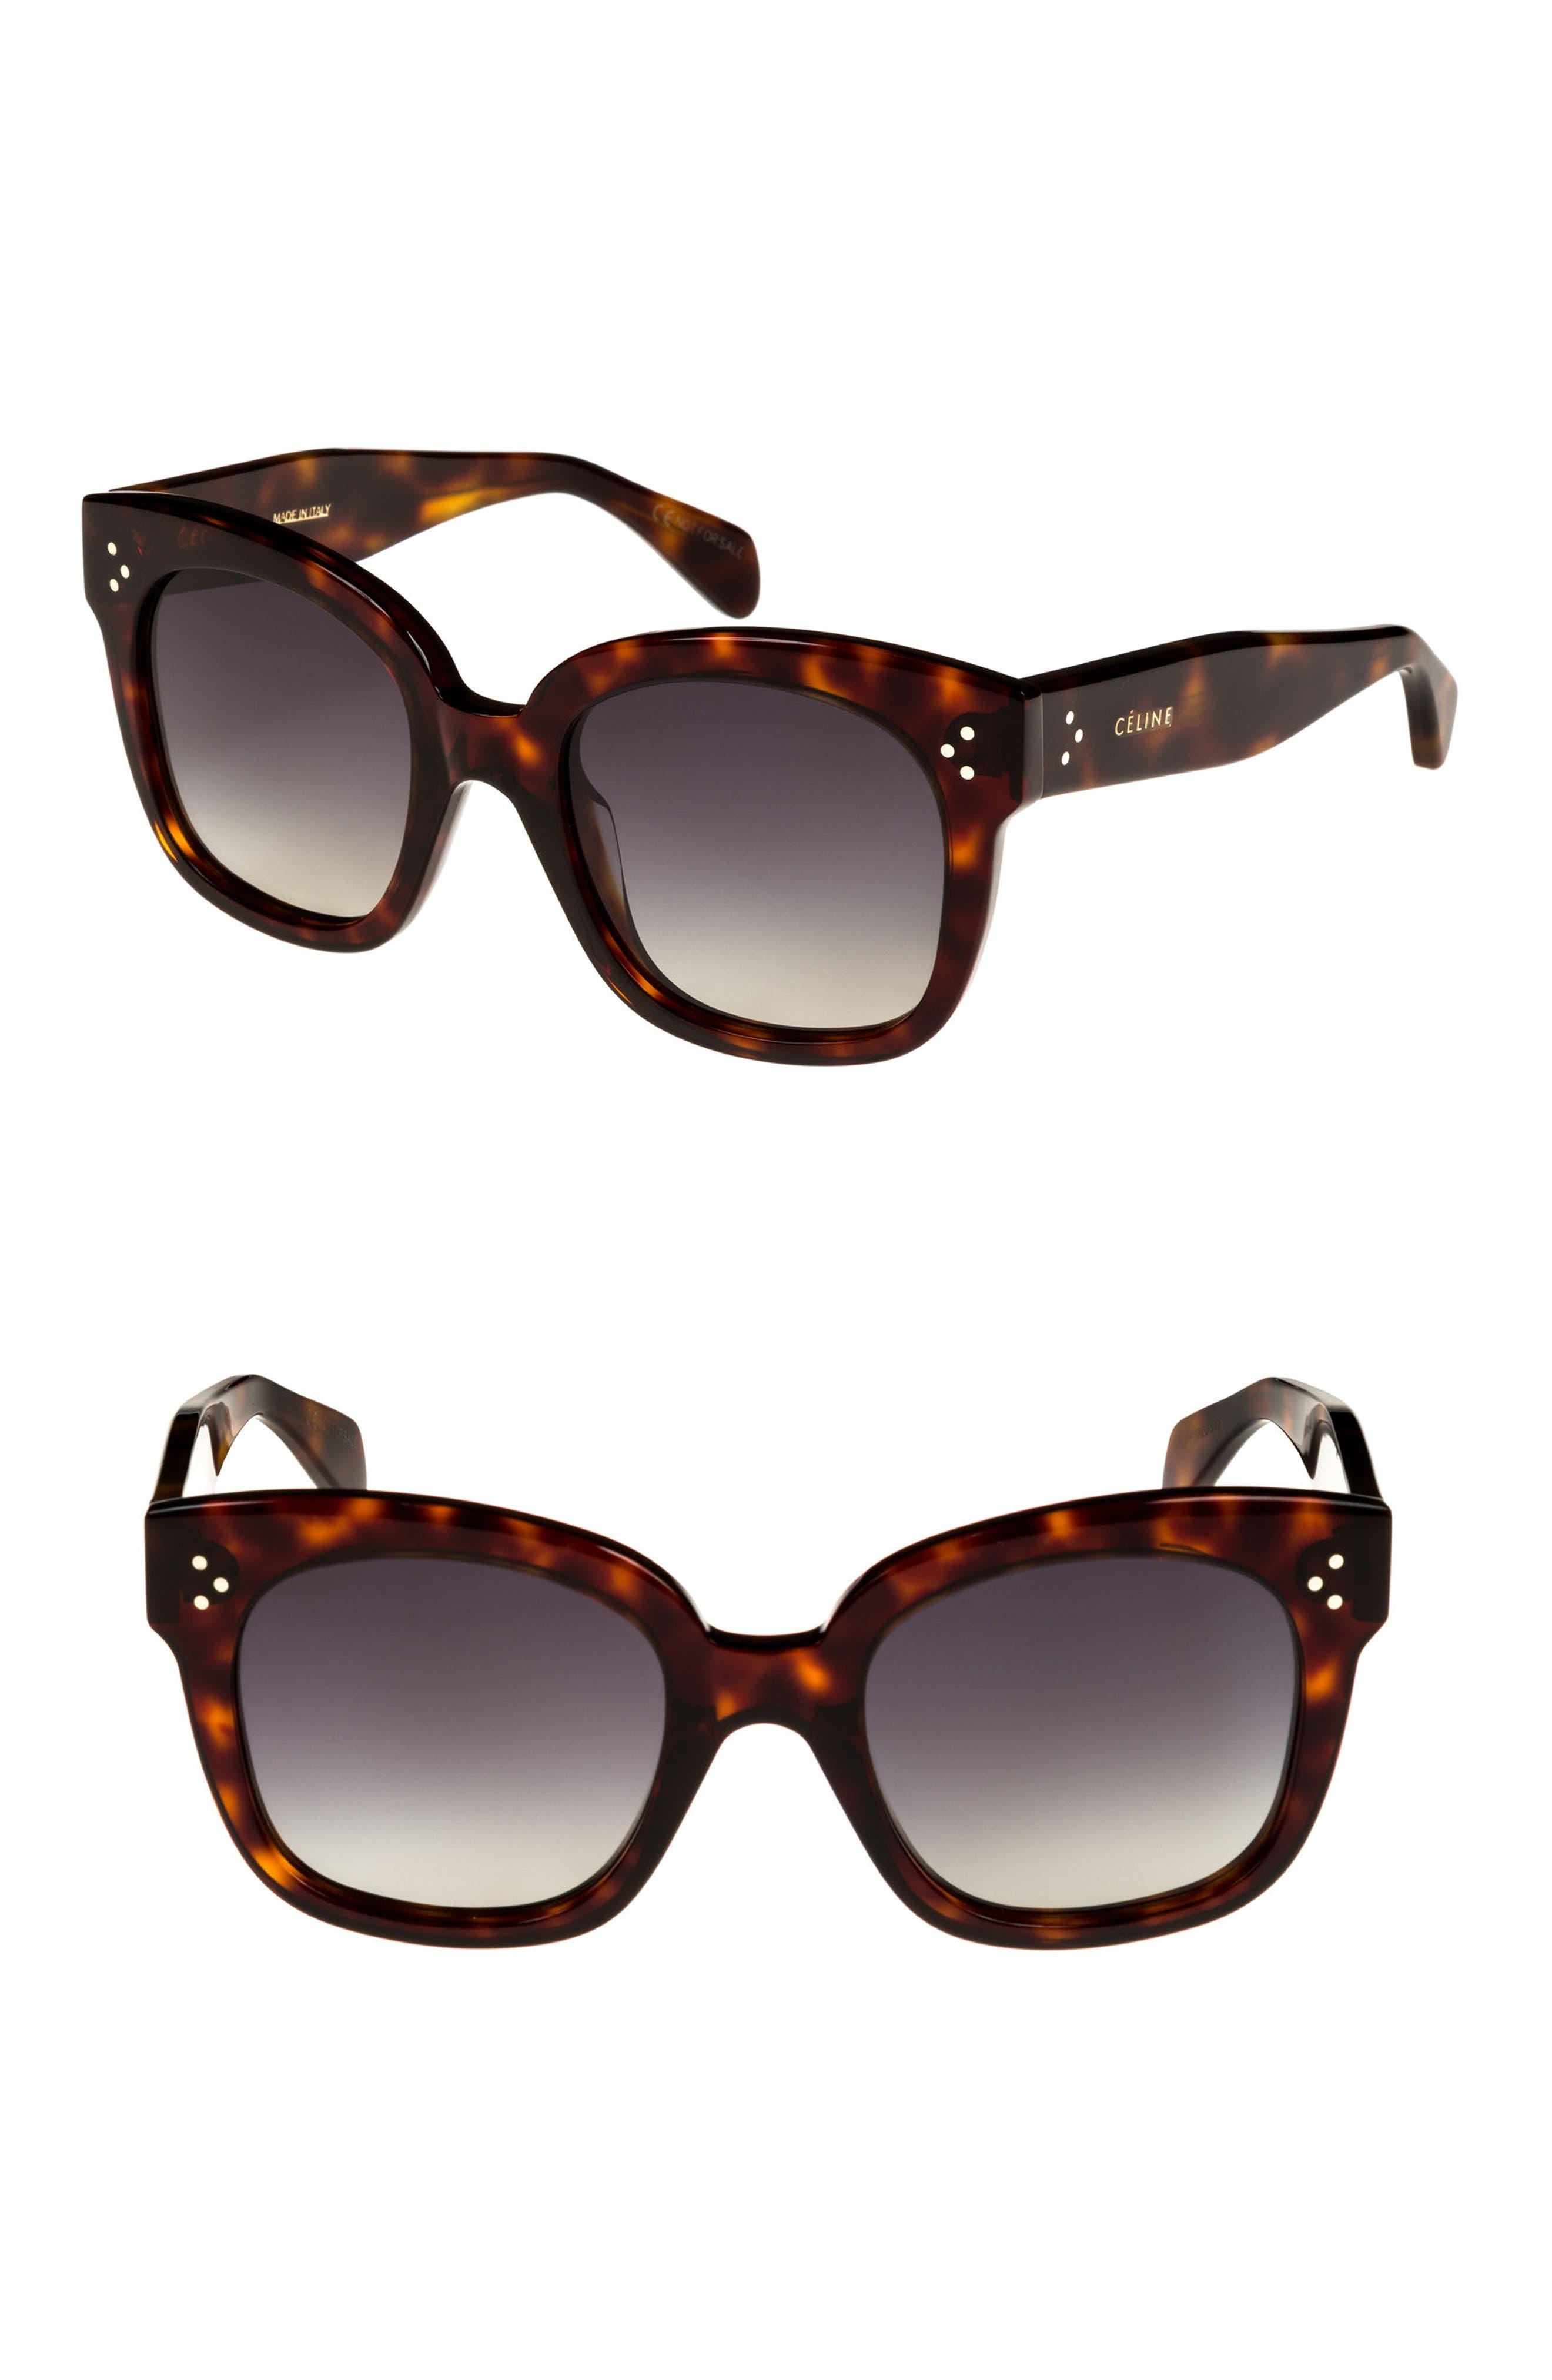 54mm Square Sunglasses,                             Main thumbnail 1, color,                             Red Havan/ Smoke